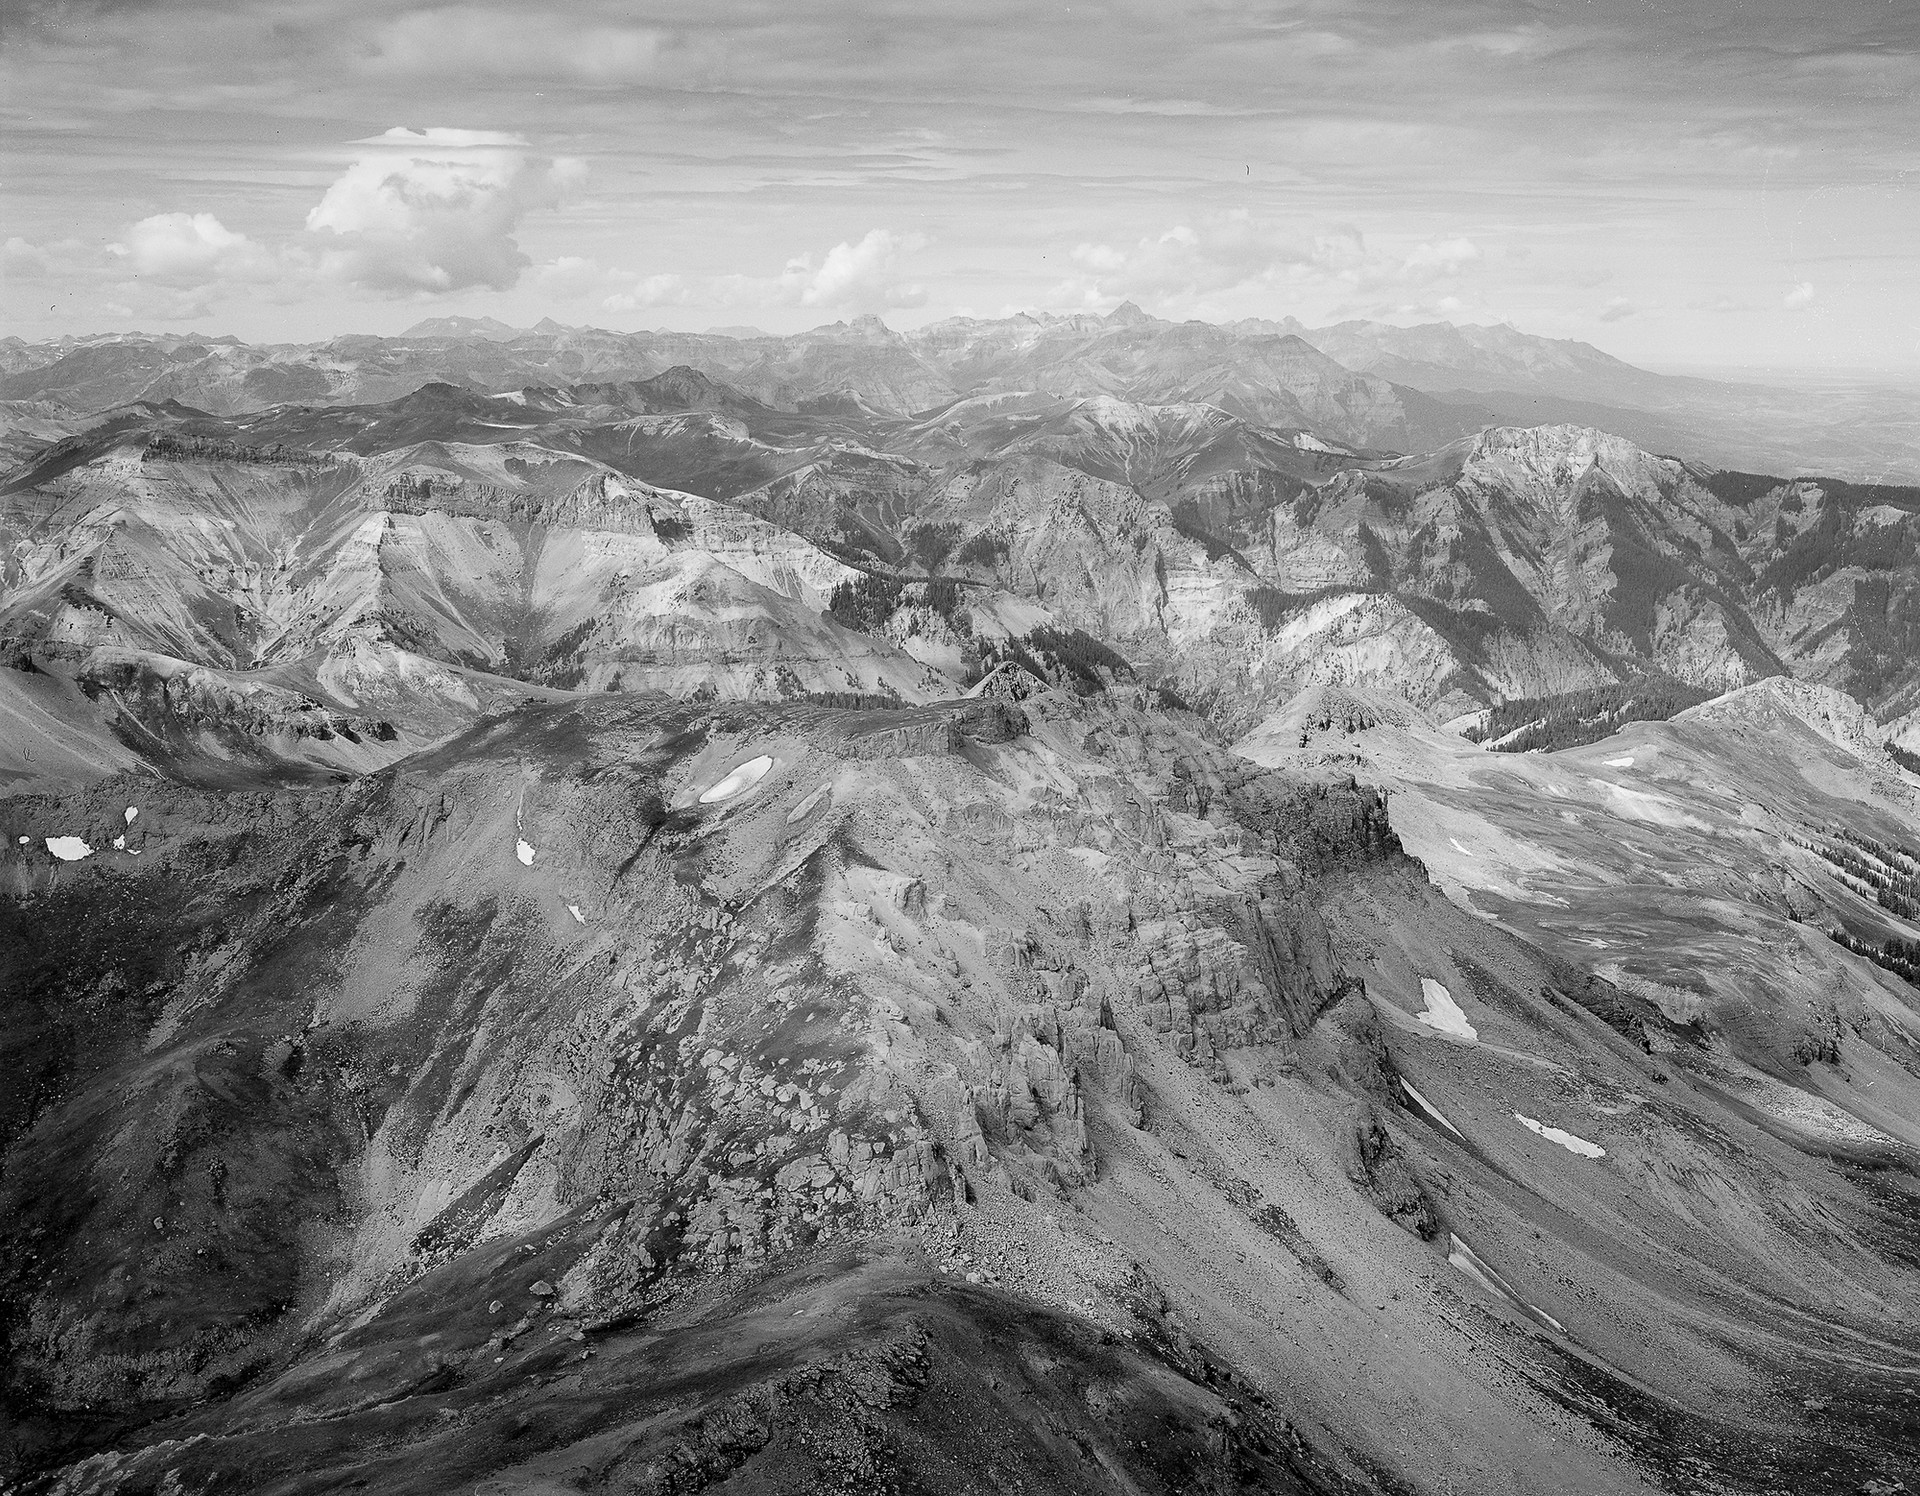 Looking West from Wetterhorn Peak